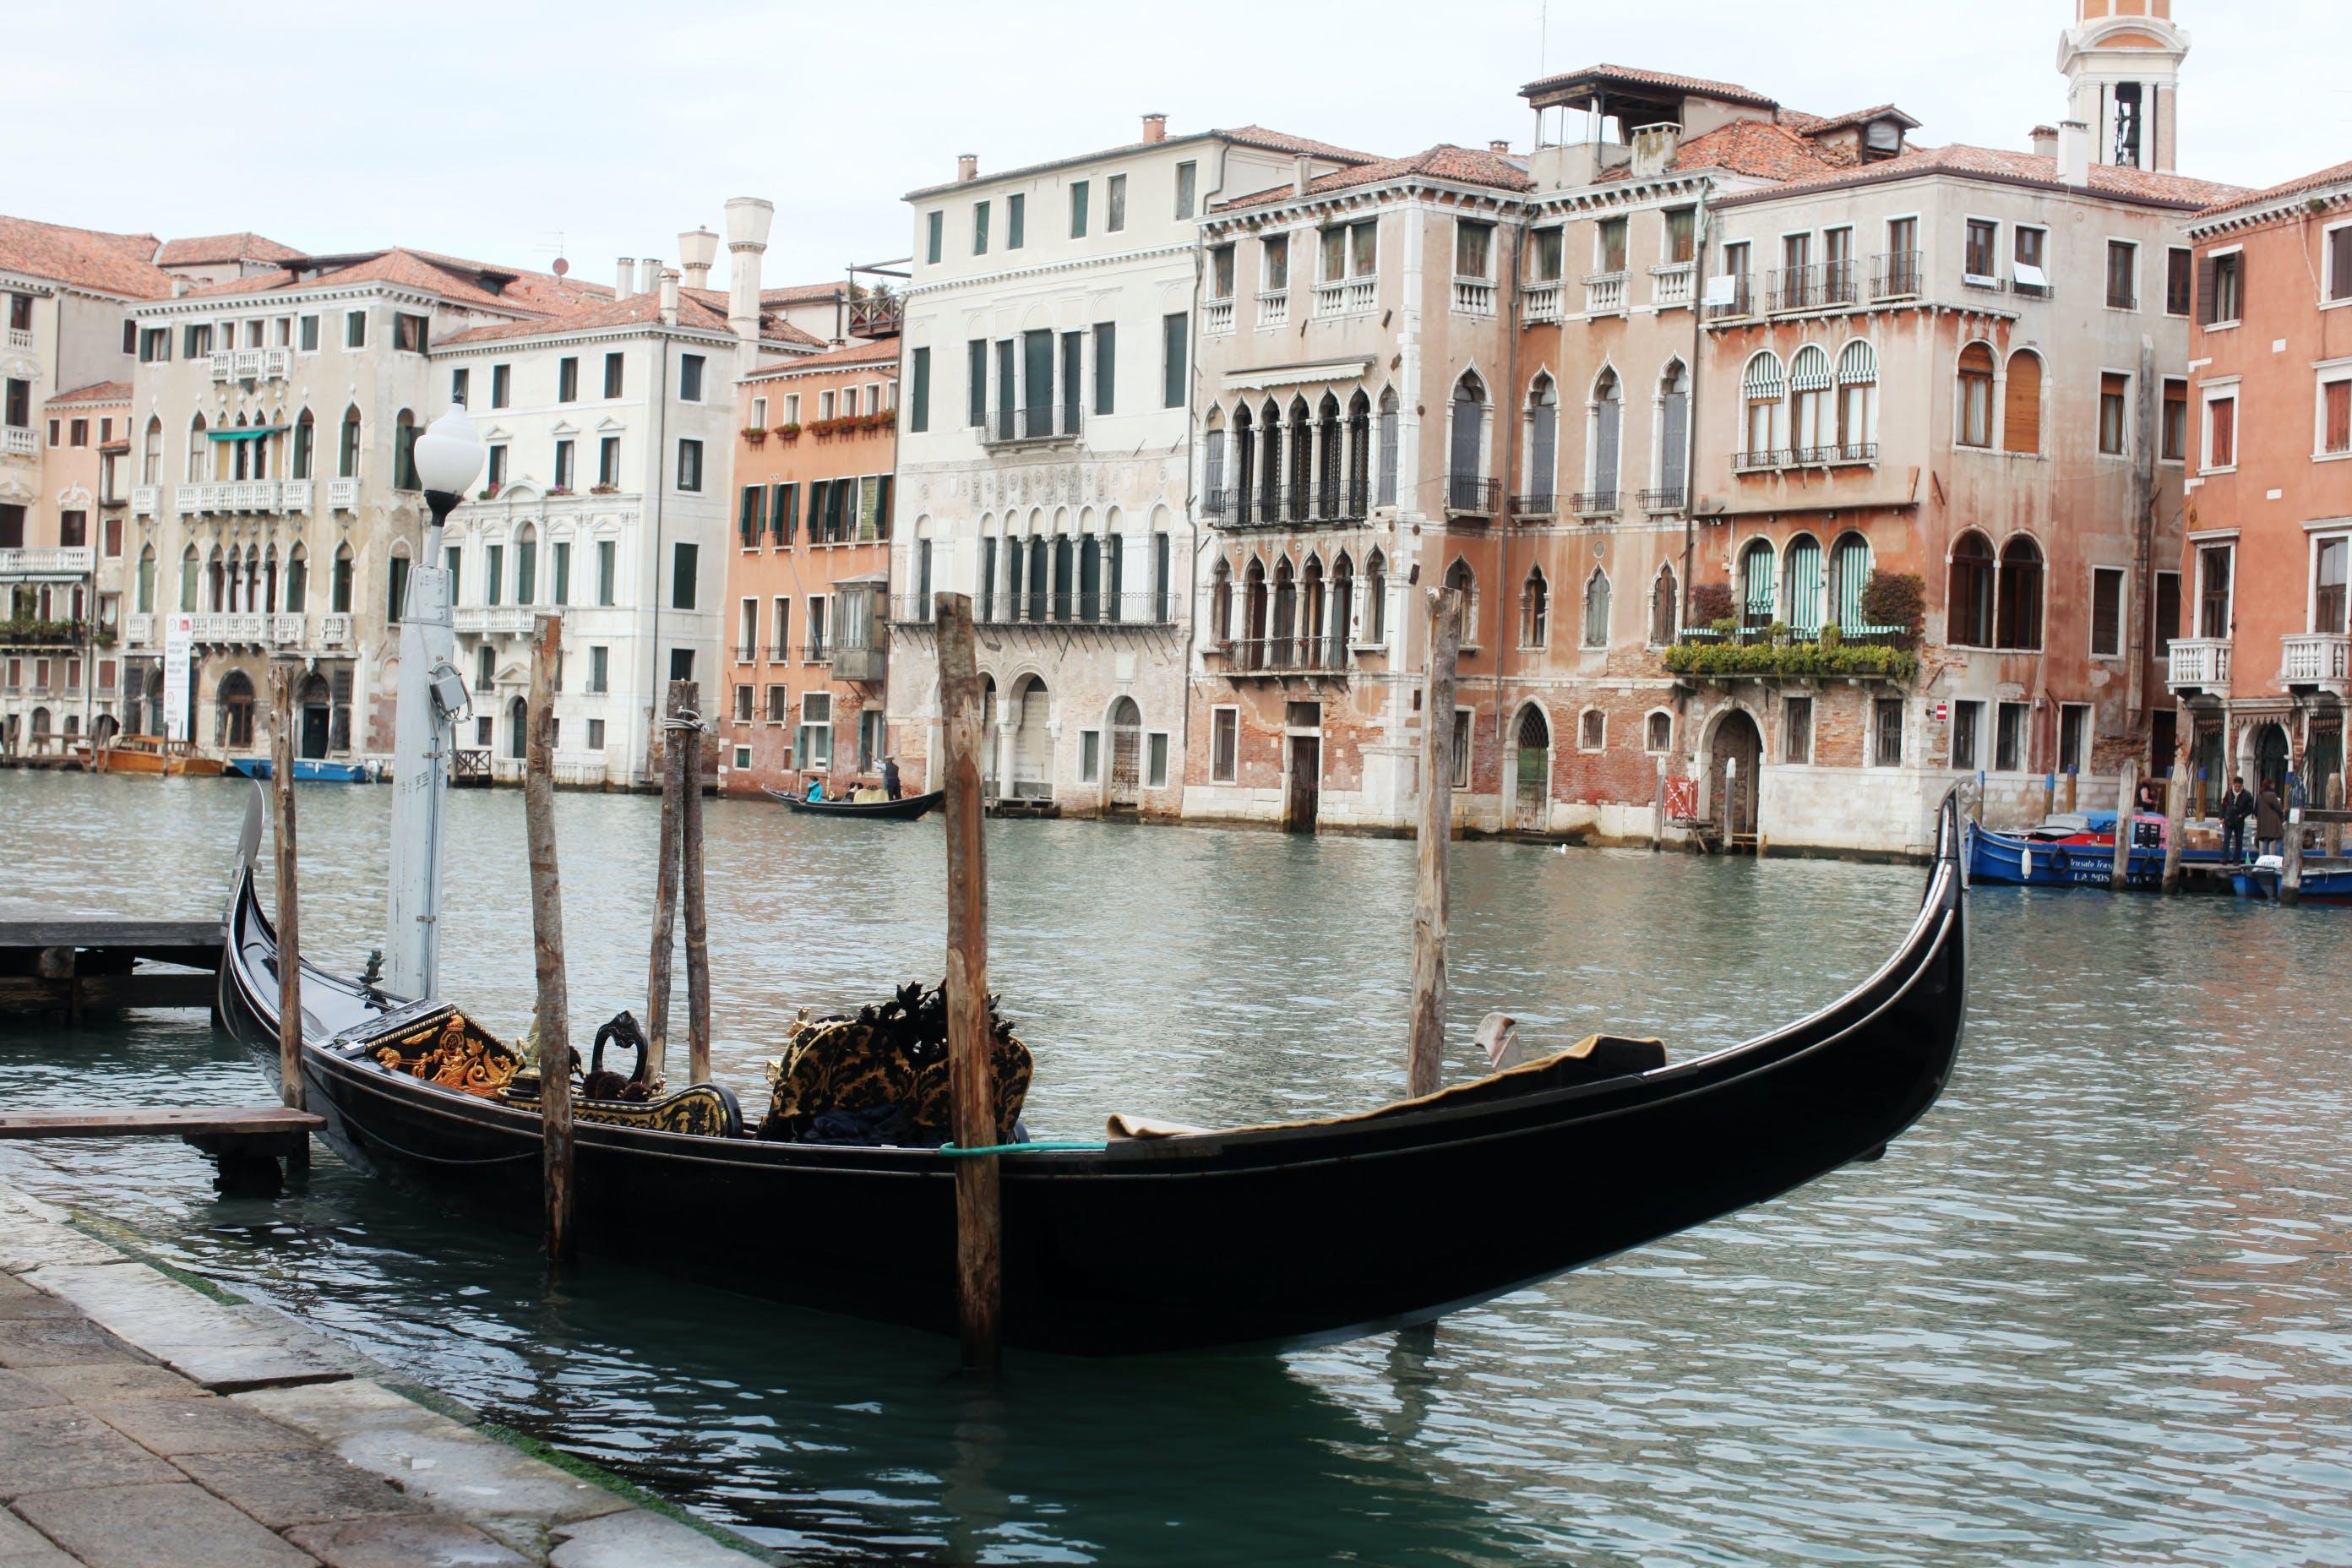 Gratis lagerfoto af #venice #italy #venezia